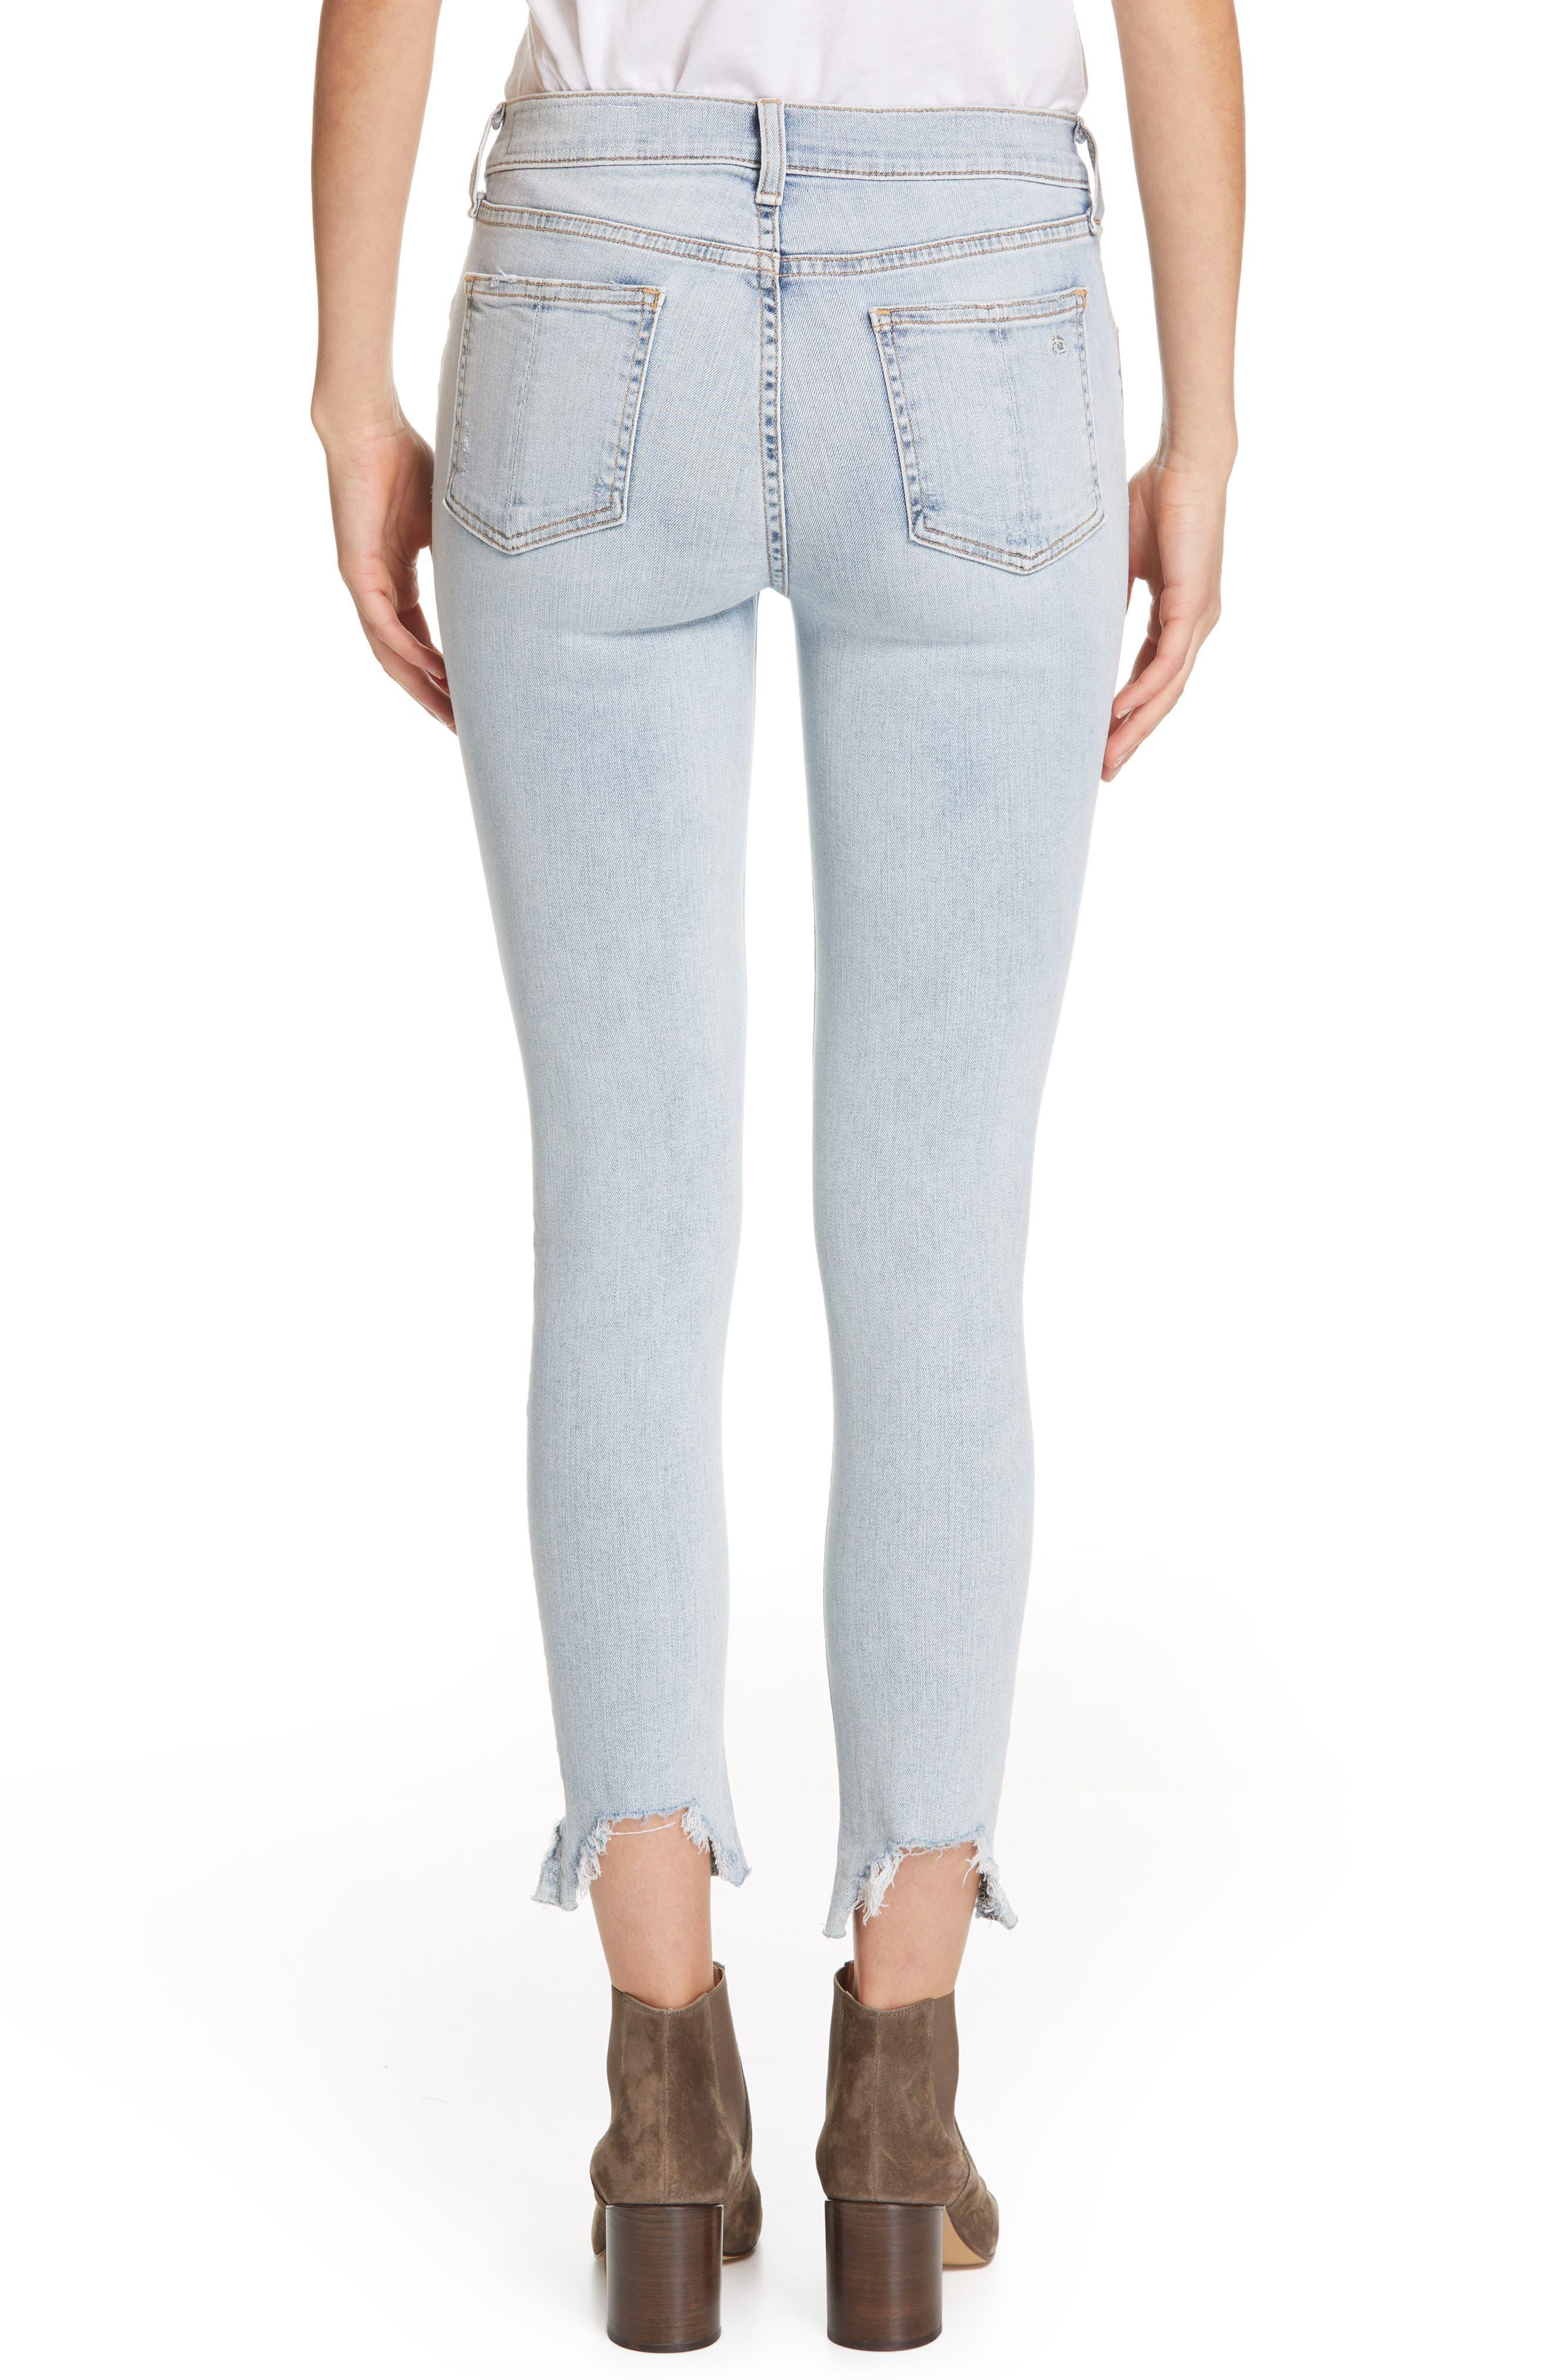 RAG & BONE, JEAN Ripped Ankle Skinny Jeans, Alternate thumbnail 2, color, 450